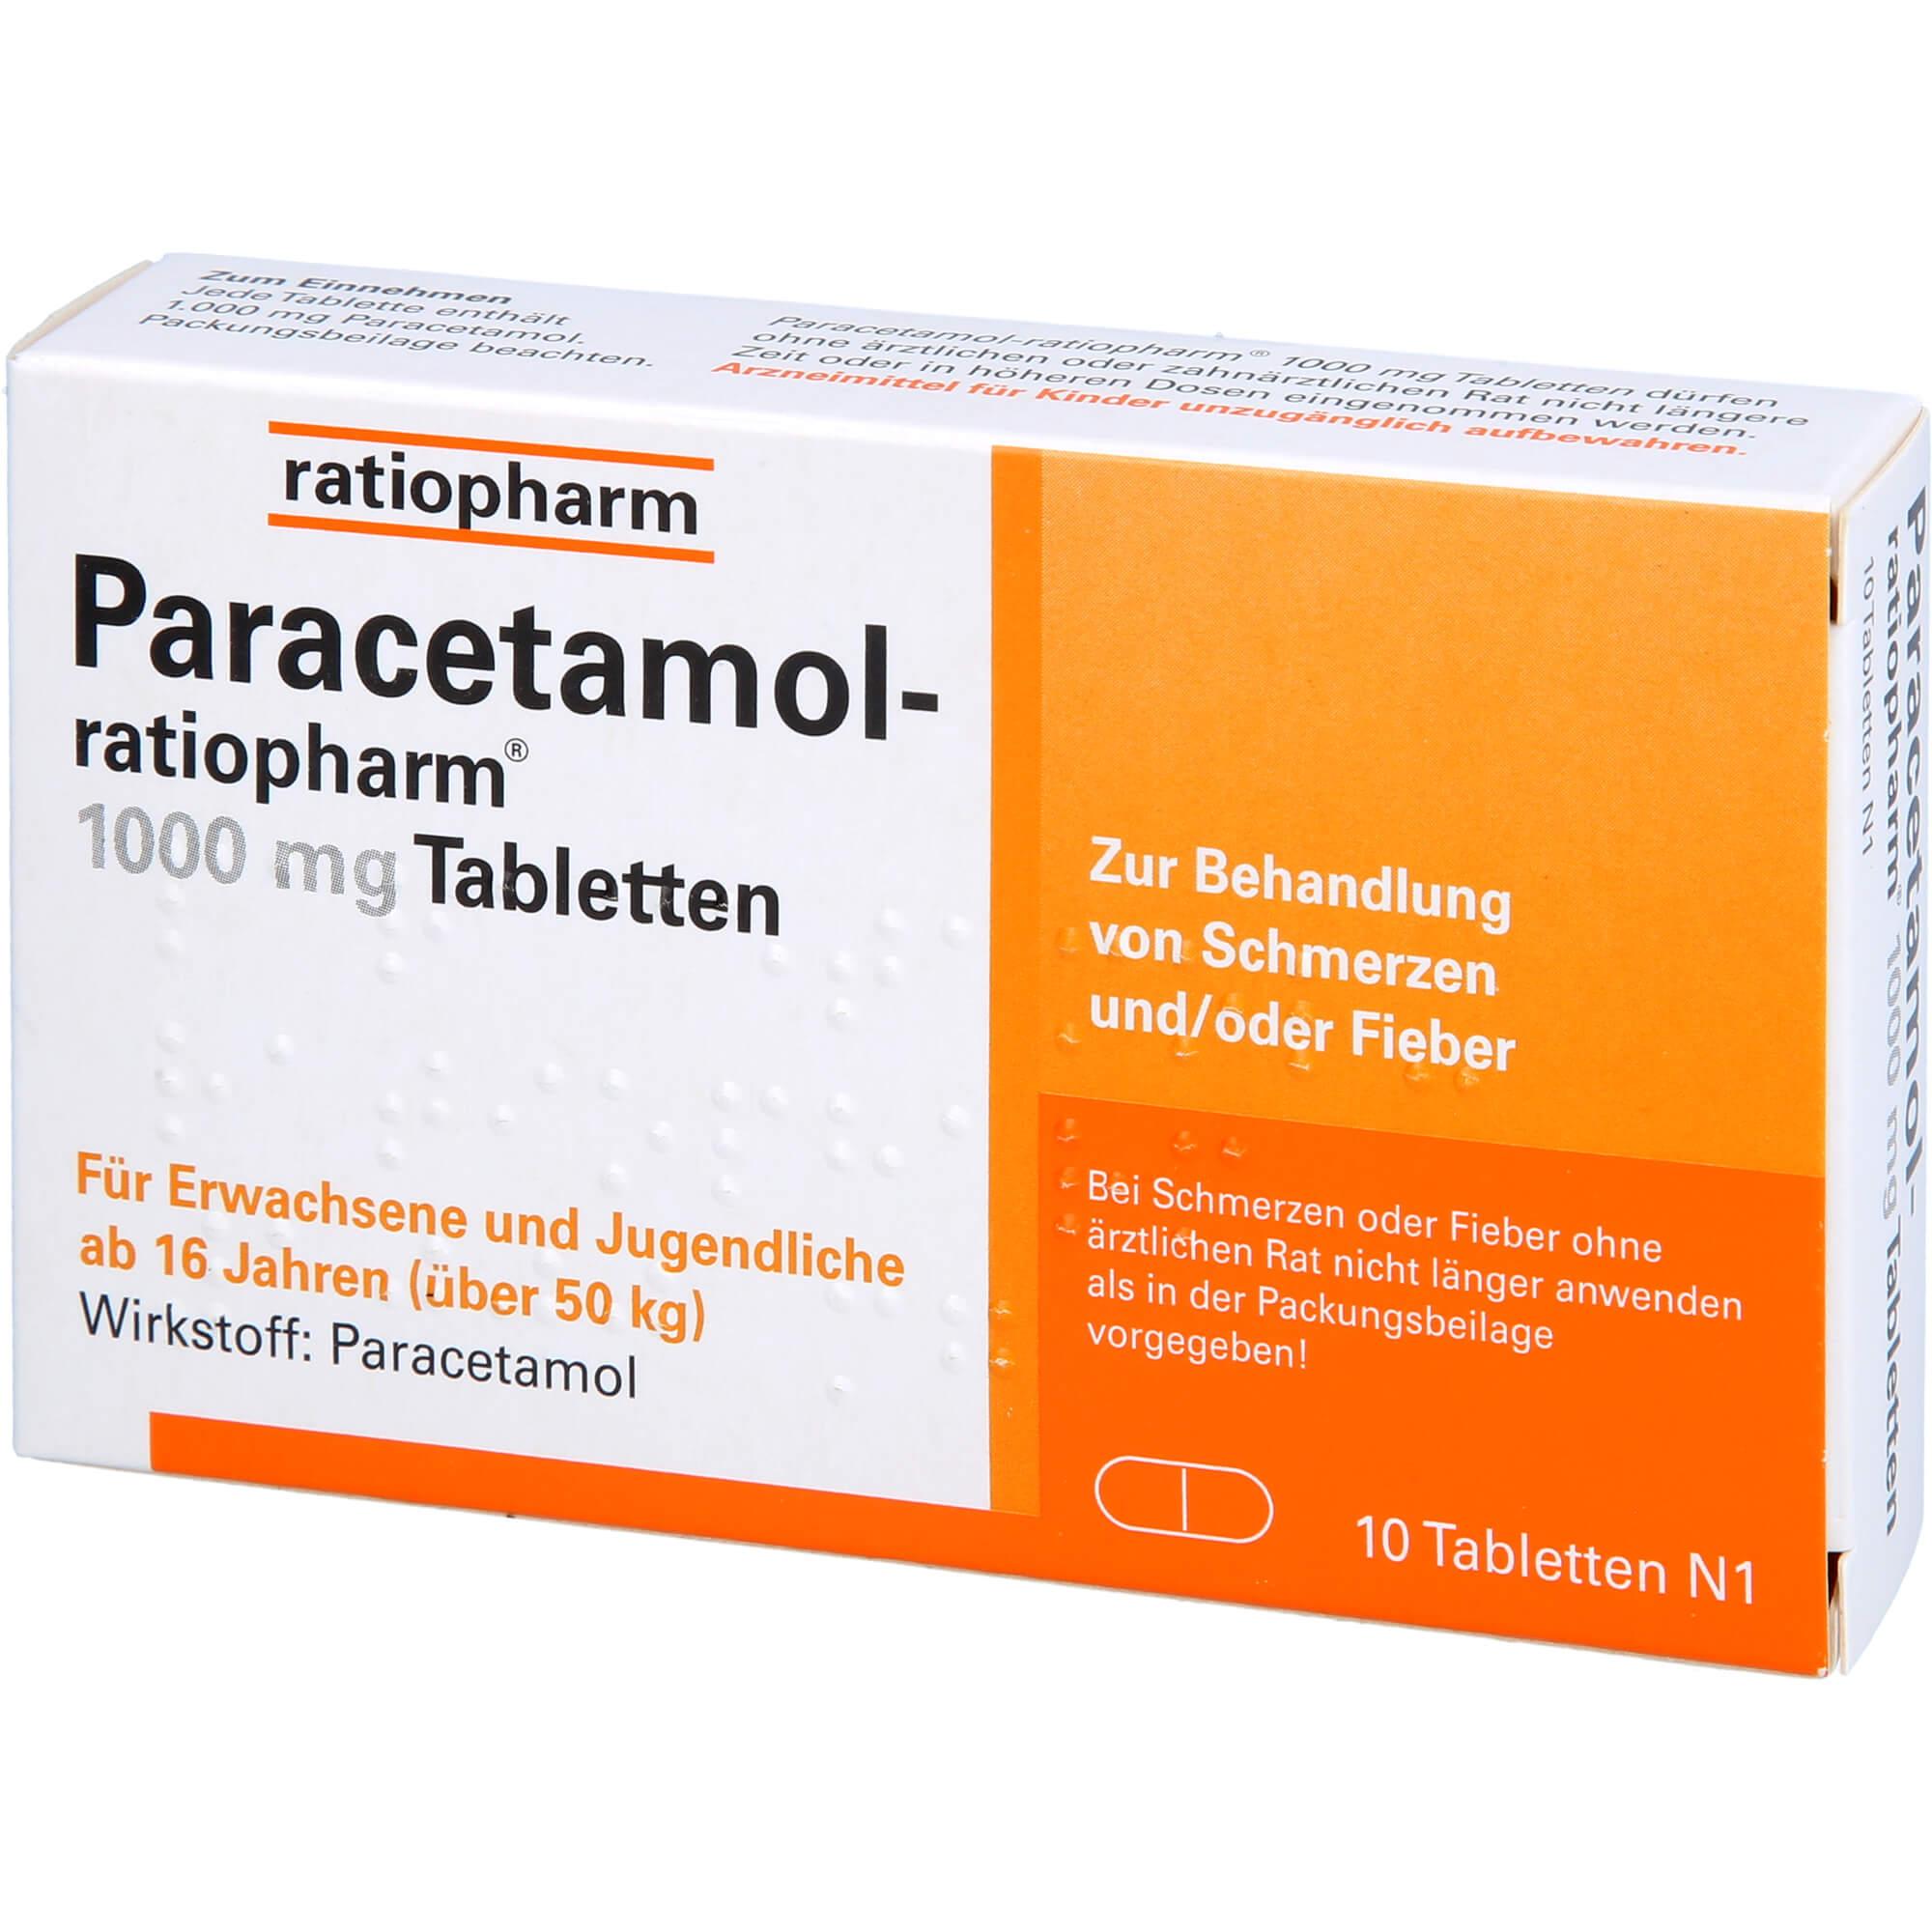 PARACETAMOL-ratiopharm-1-000-mg-Tabletten